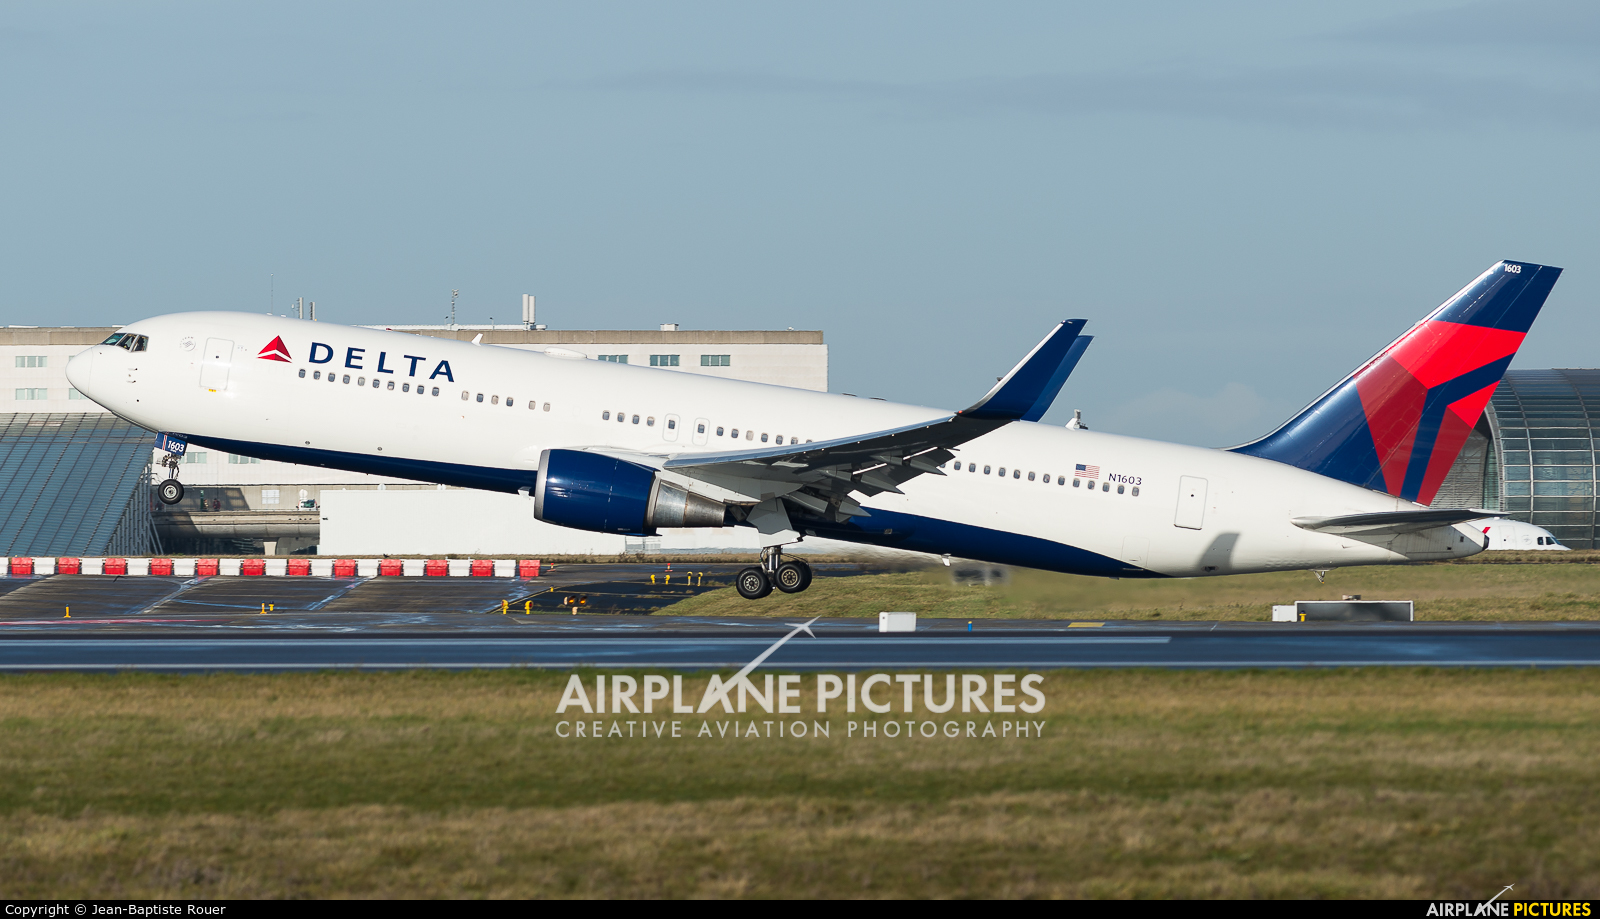 Delta Air Lines N1603 aircraft at Paris - Charles de Gaulle